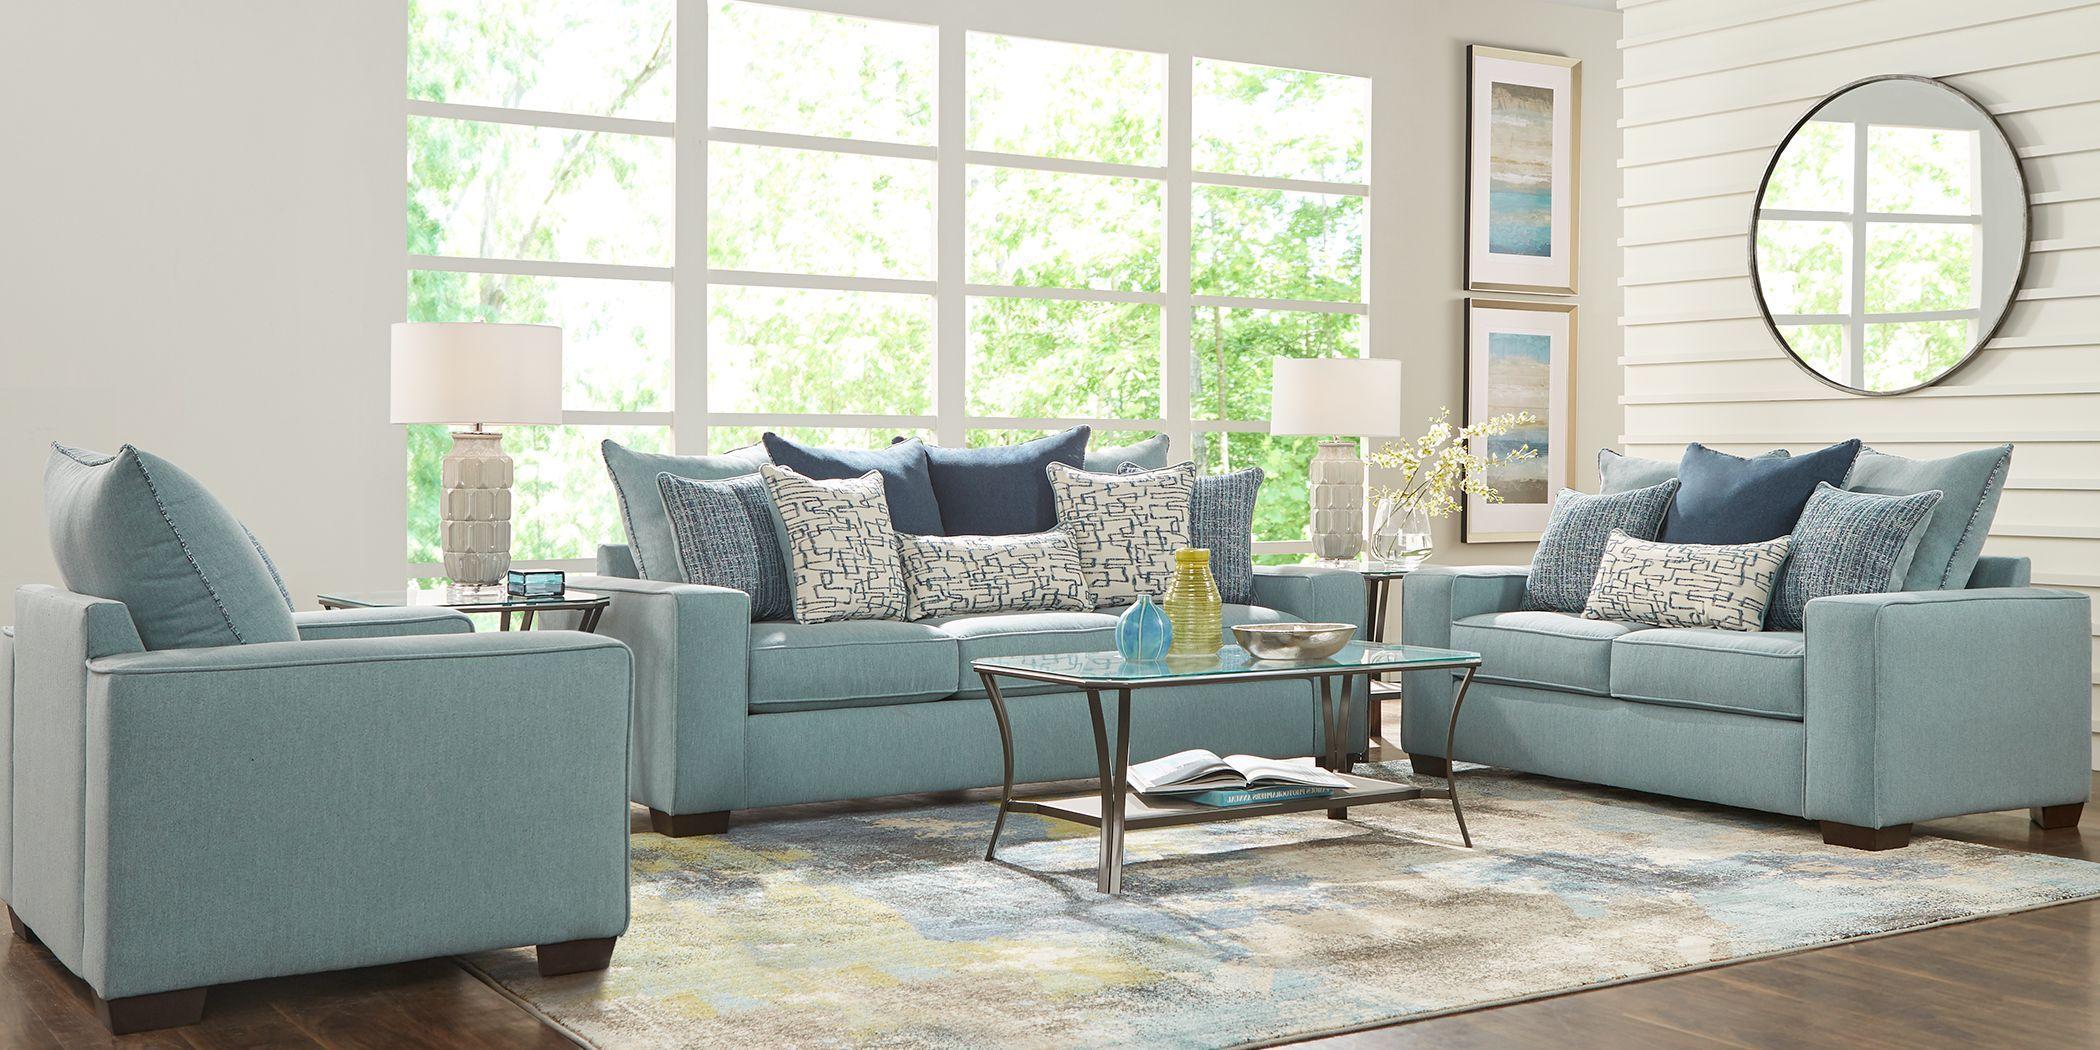 Best Fiona Lane Teal 5 Pc Living Room Living Room Sets 400 x 300